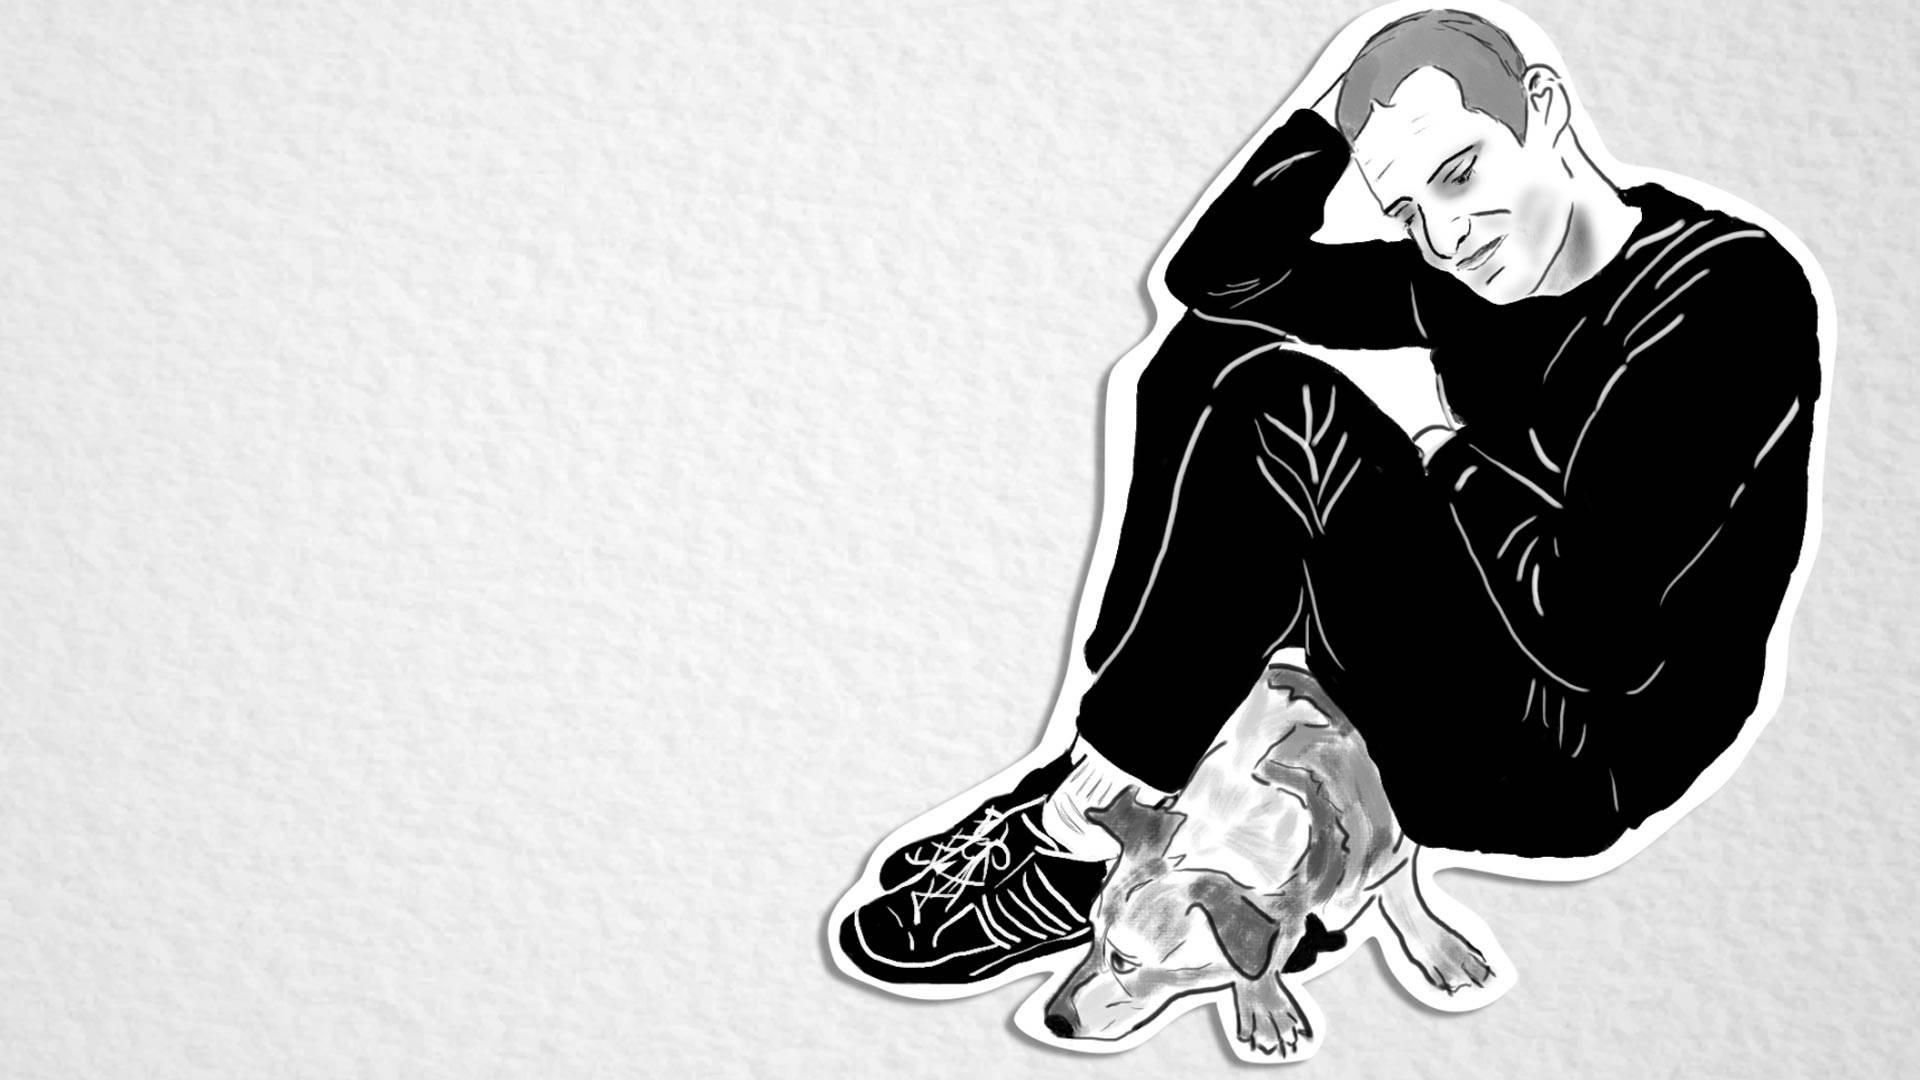 Edmond Lapine. Illustration by Melanie Ruiz/KQED